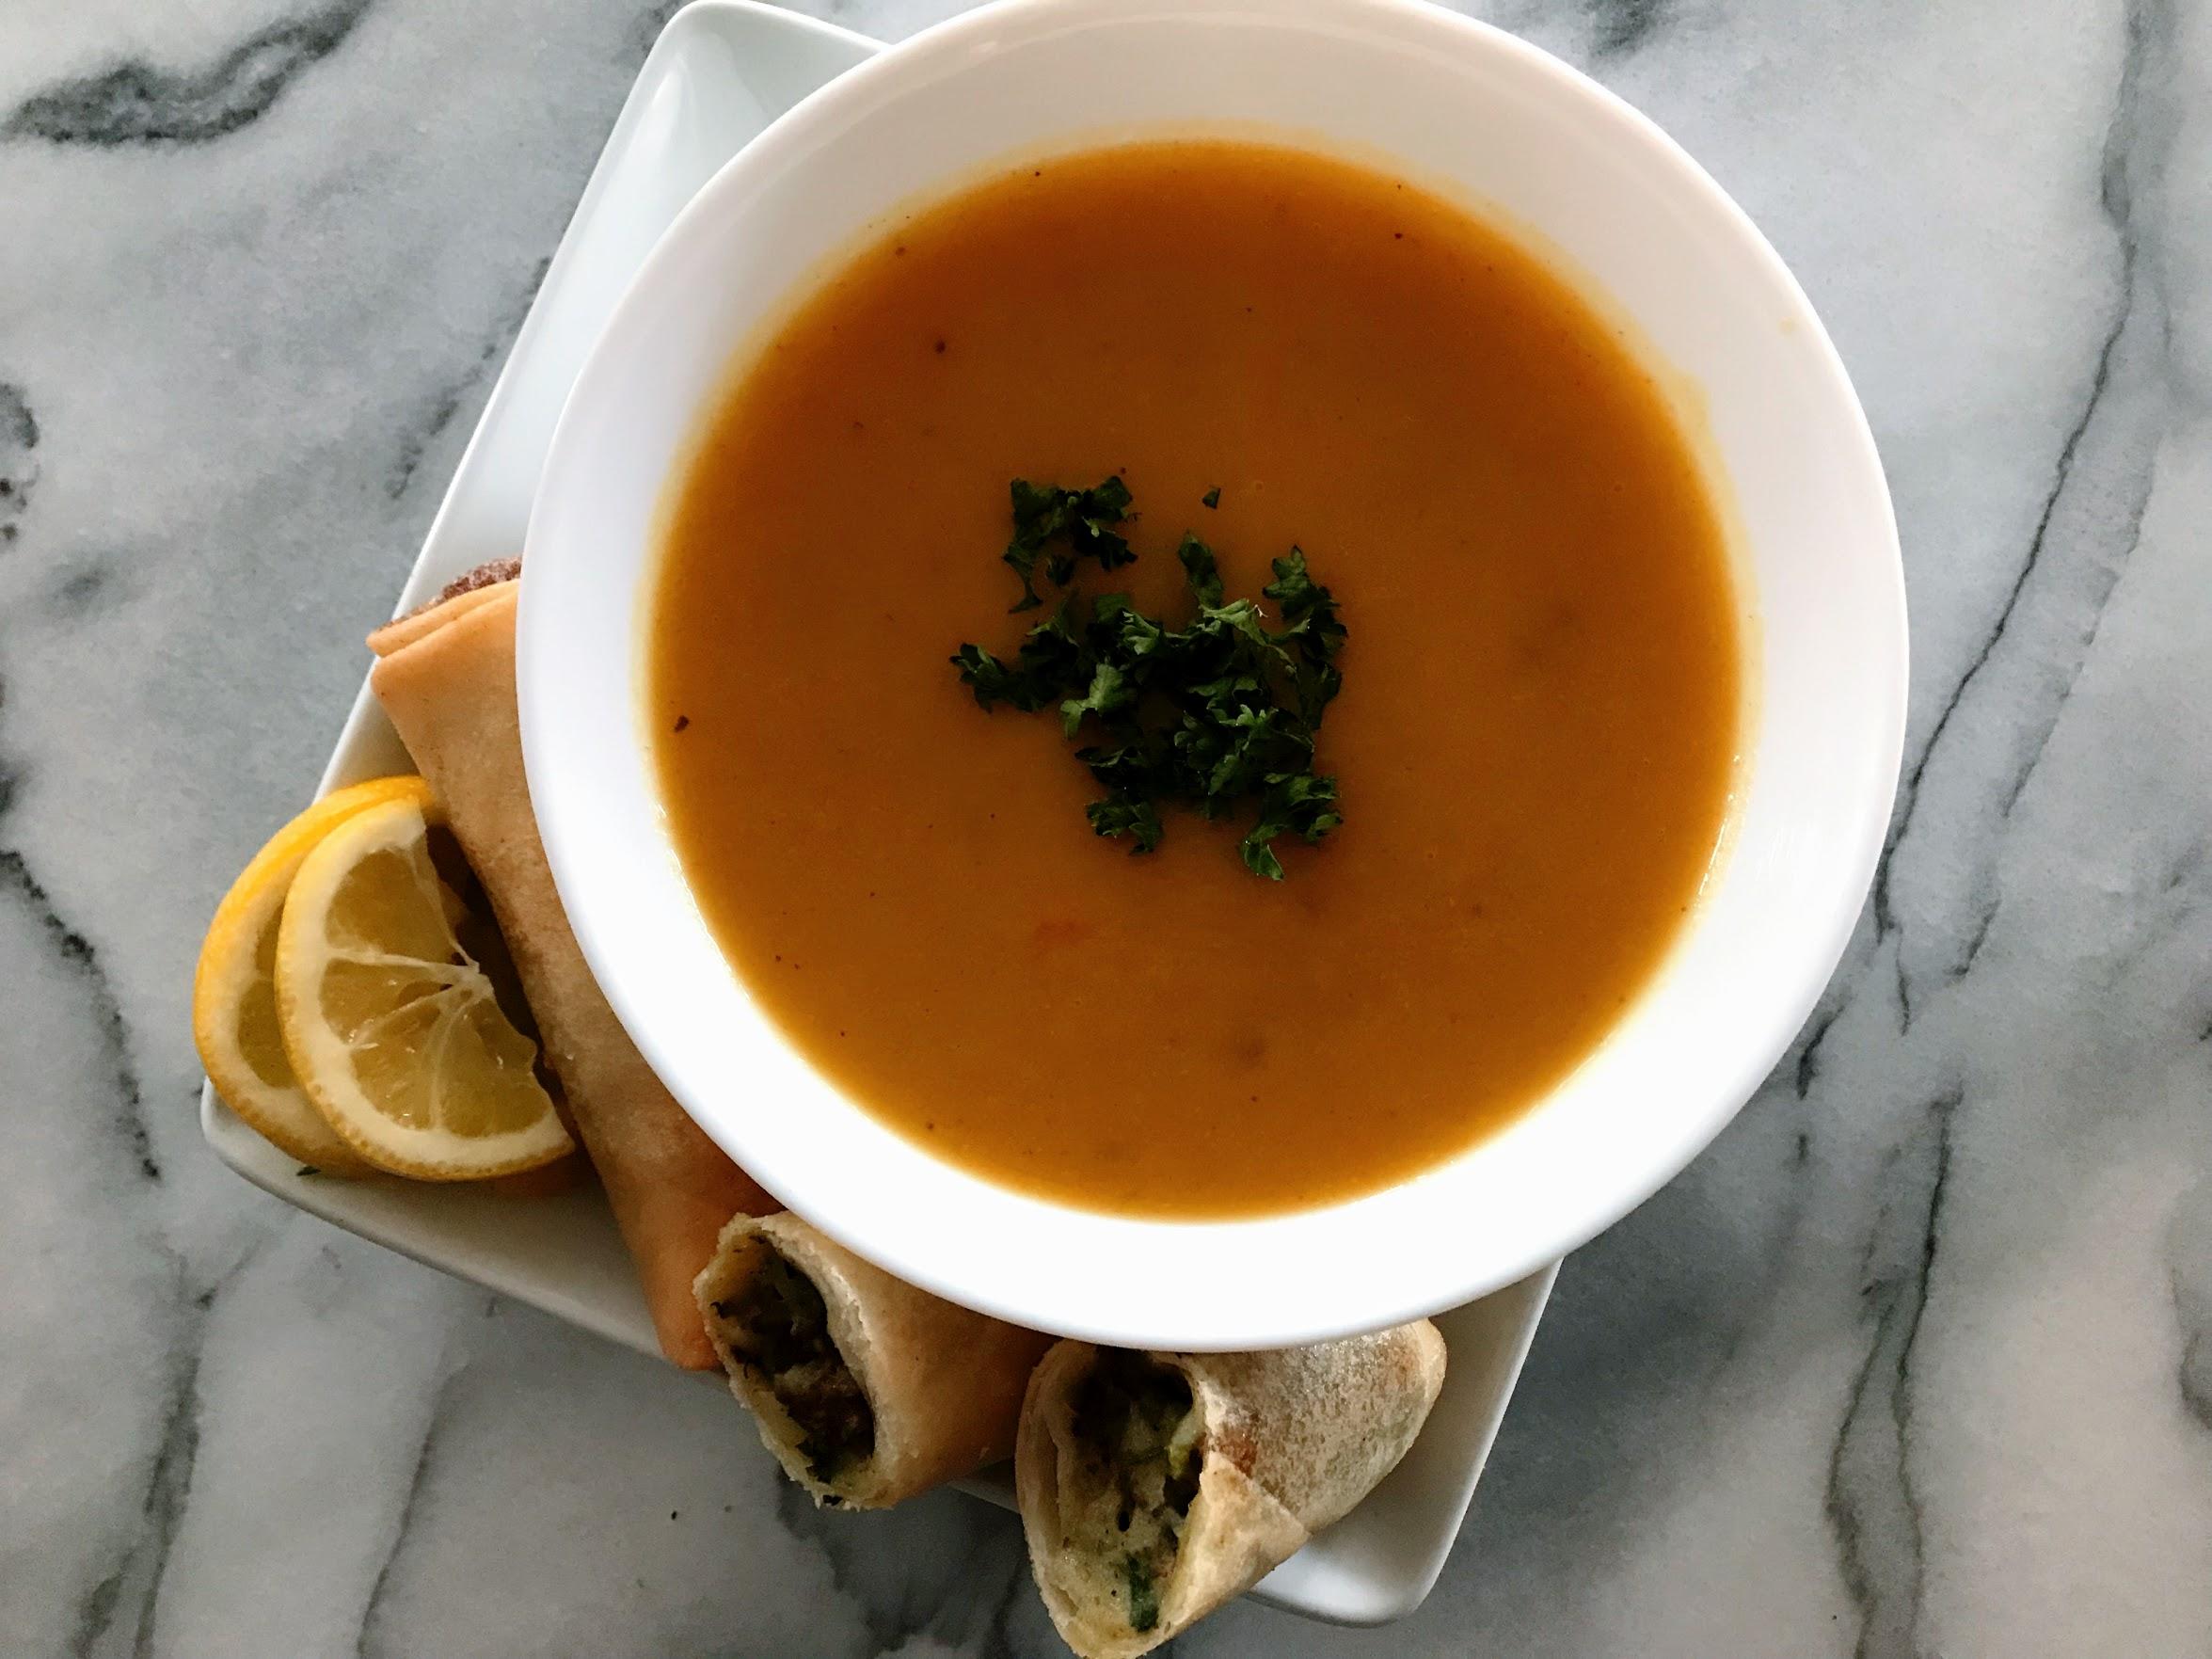 Algerian tomato and veggies soup recipe